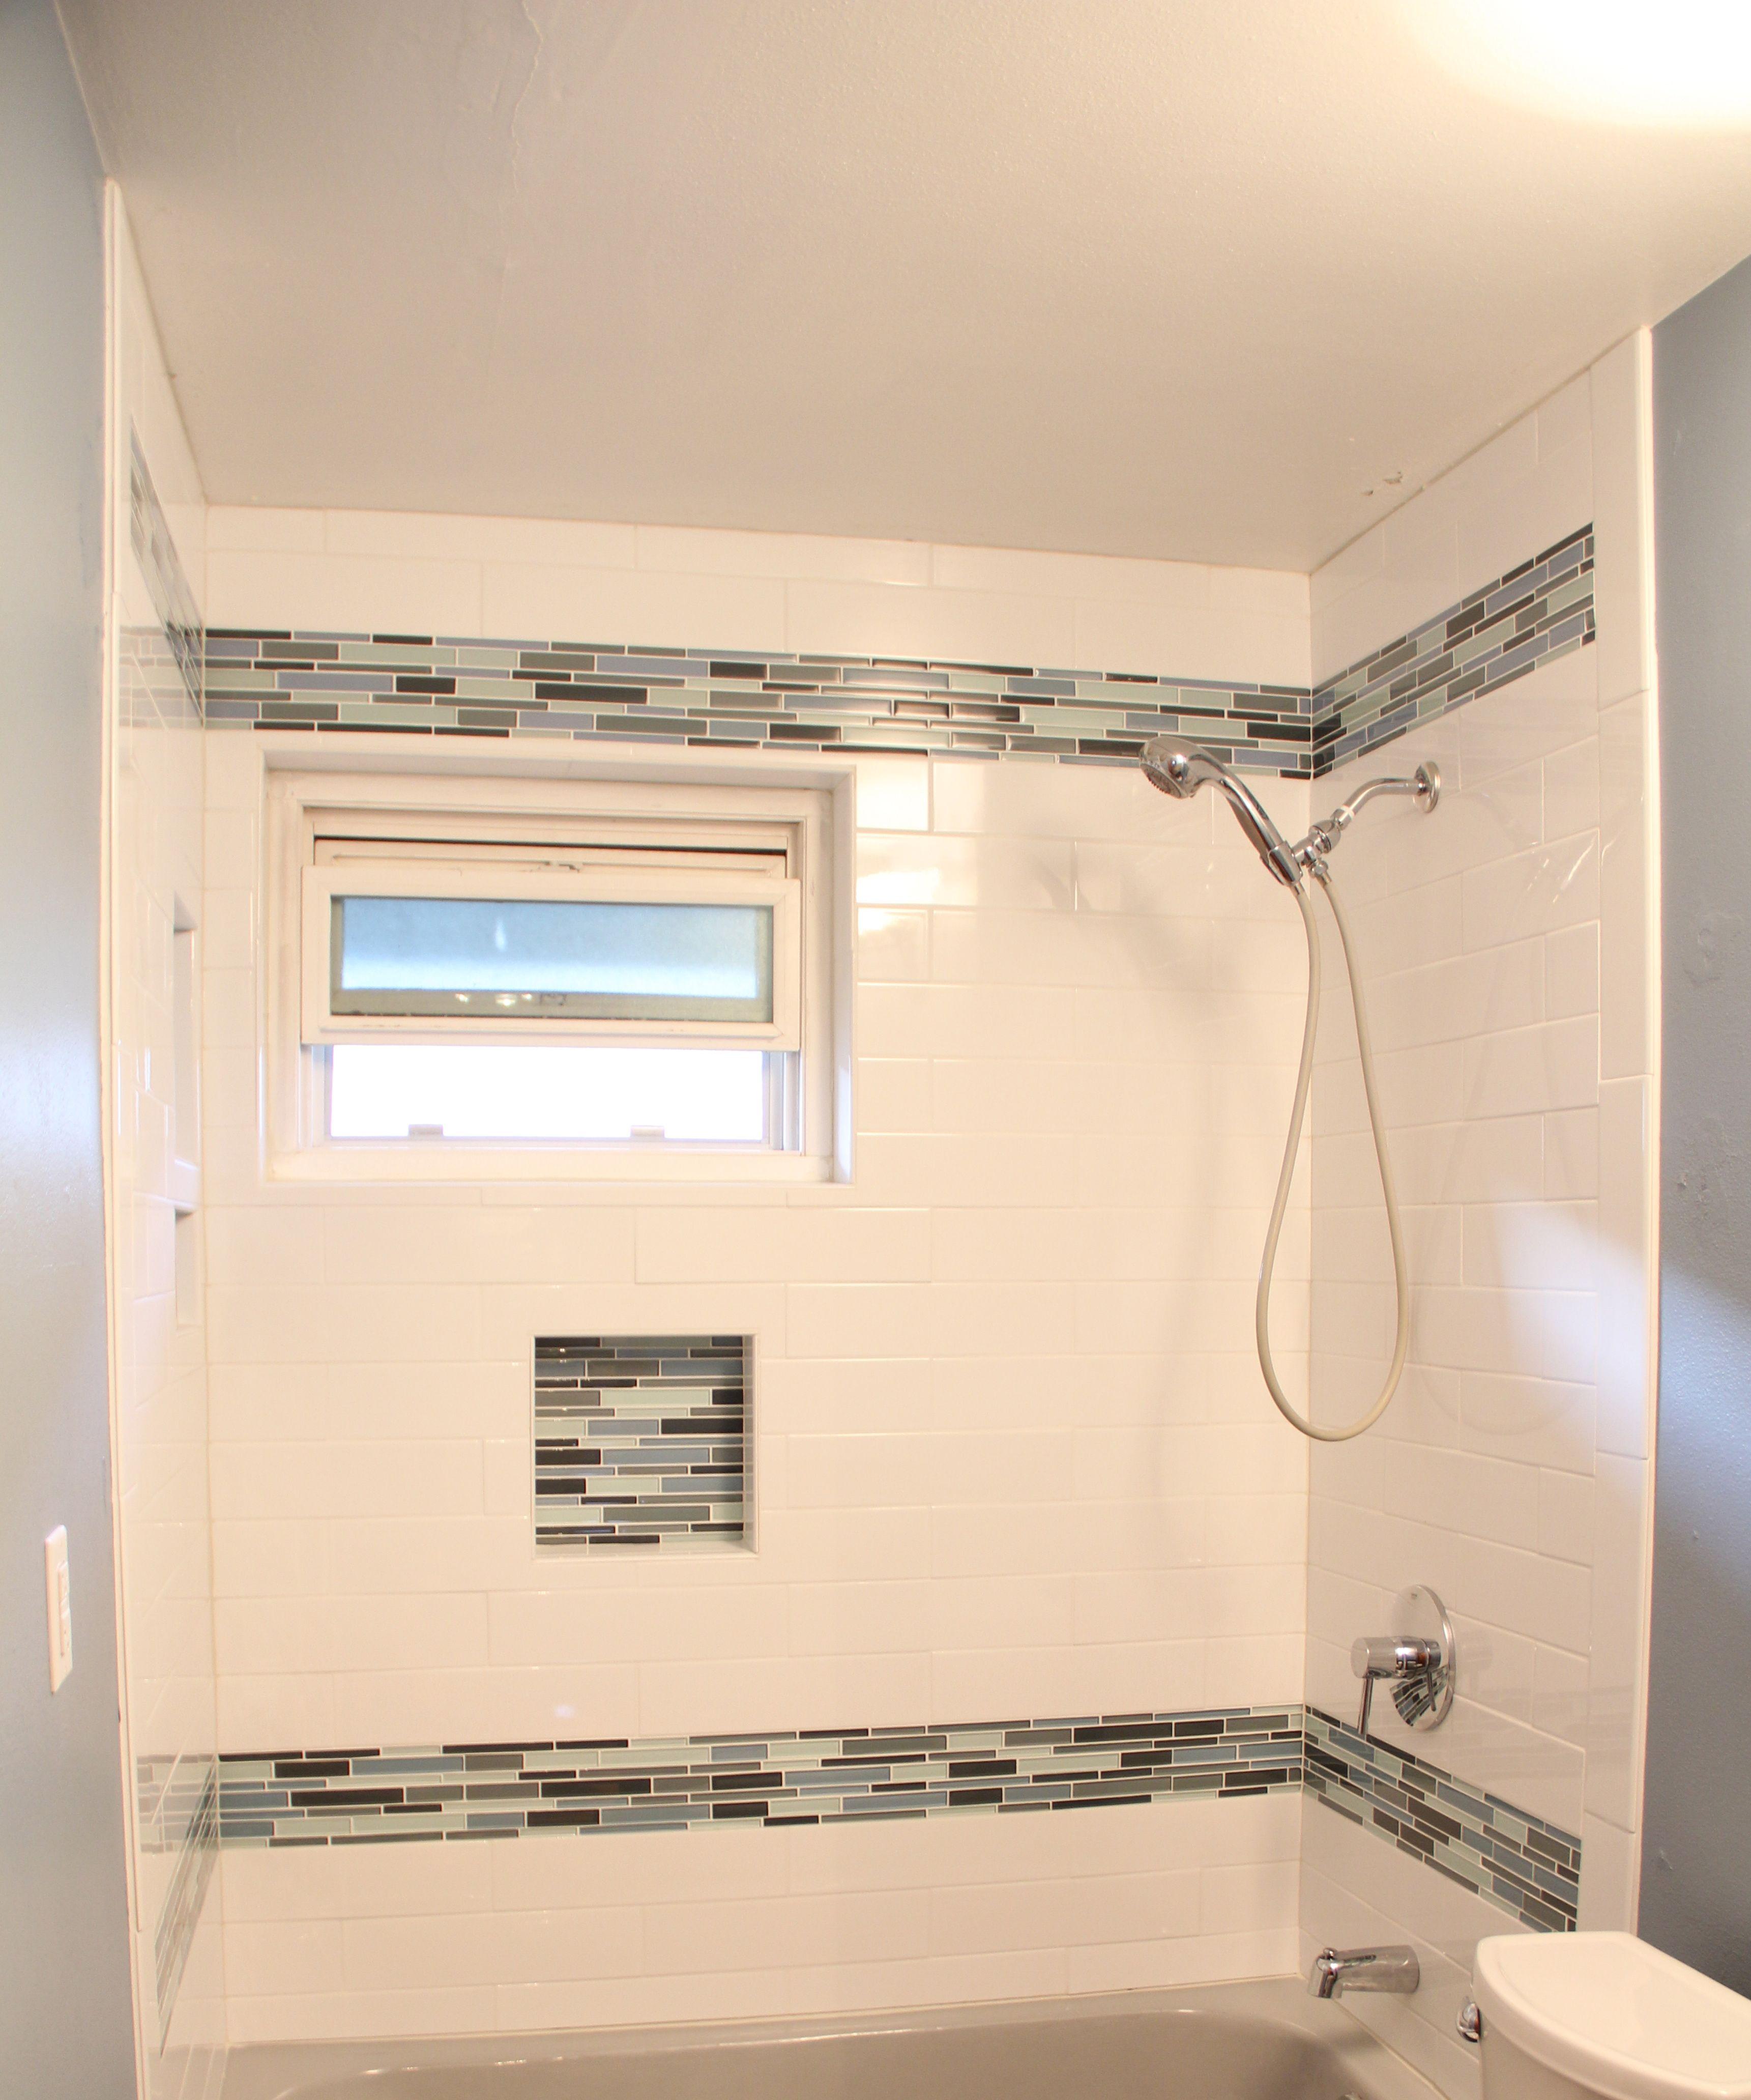 Shower Surround Tile Bathroom Ideas Pinterest